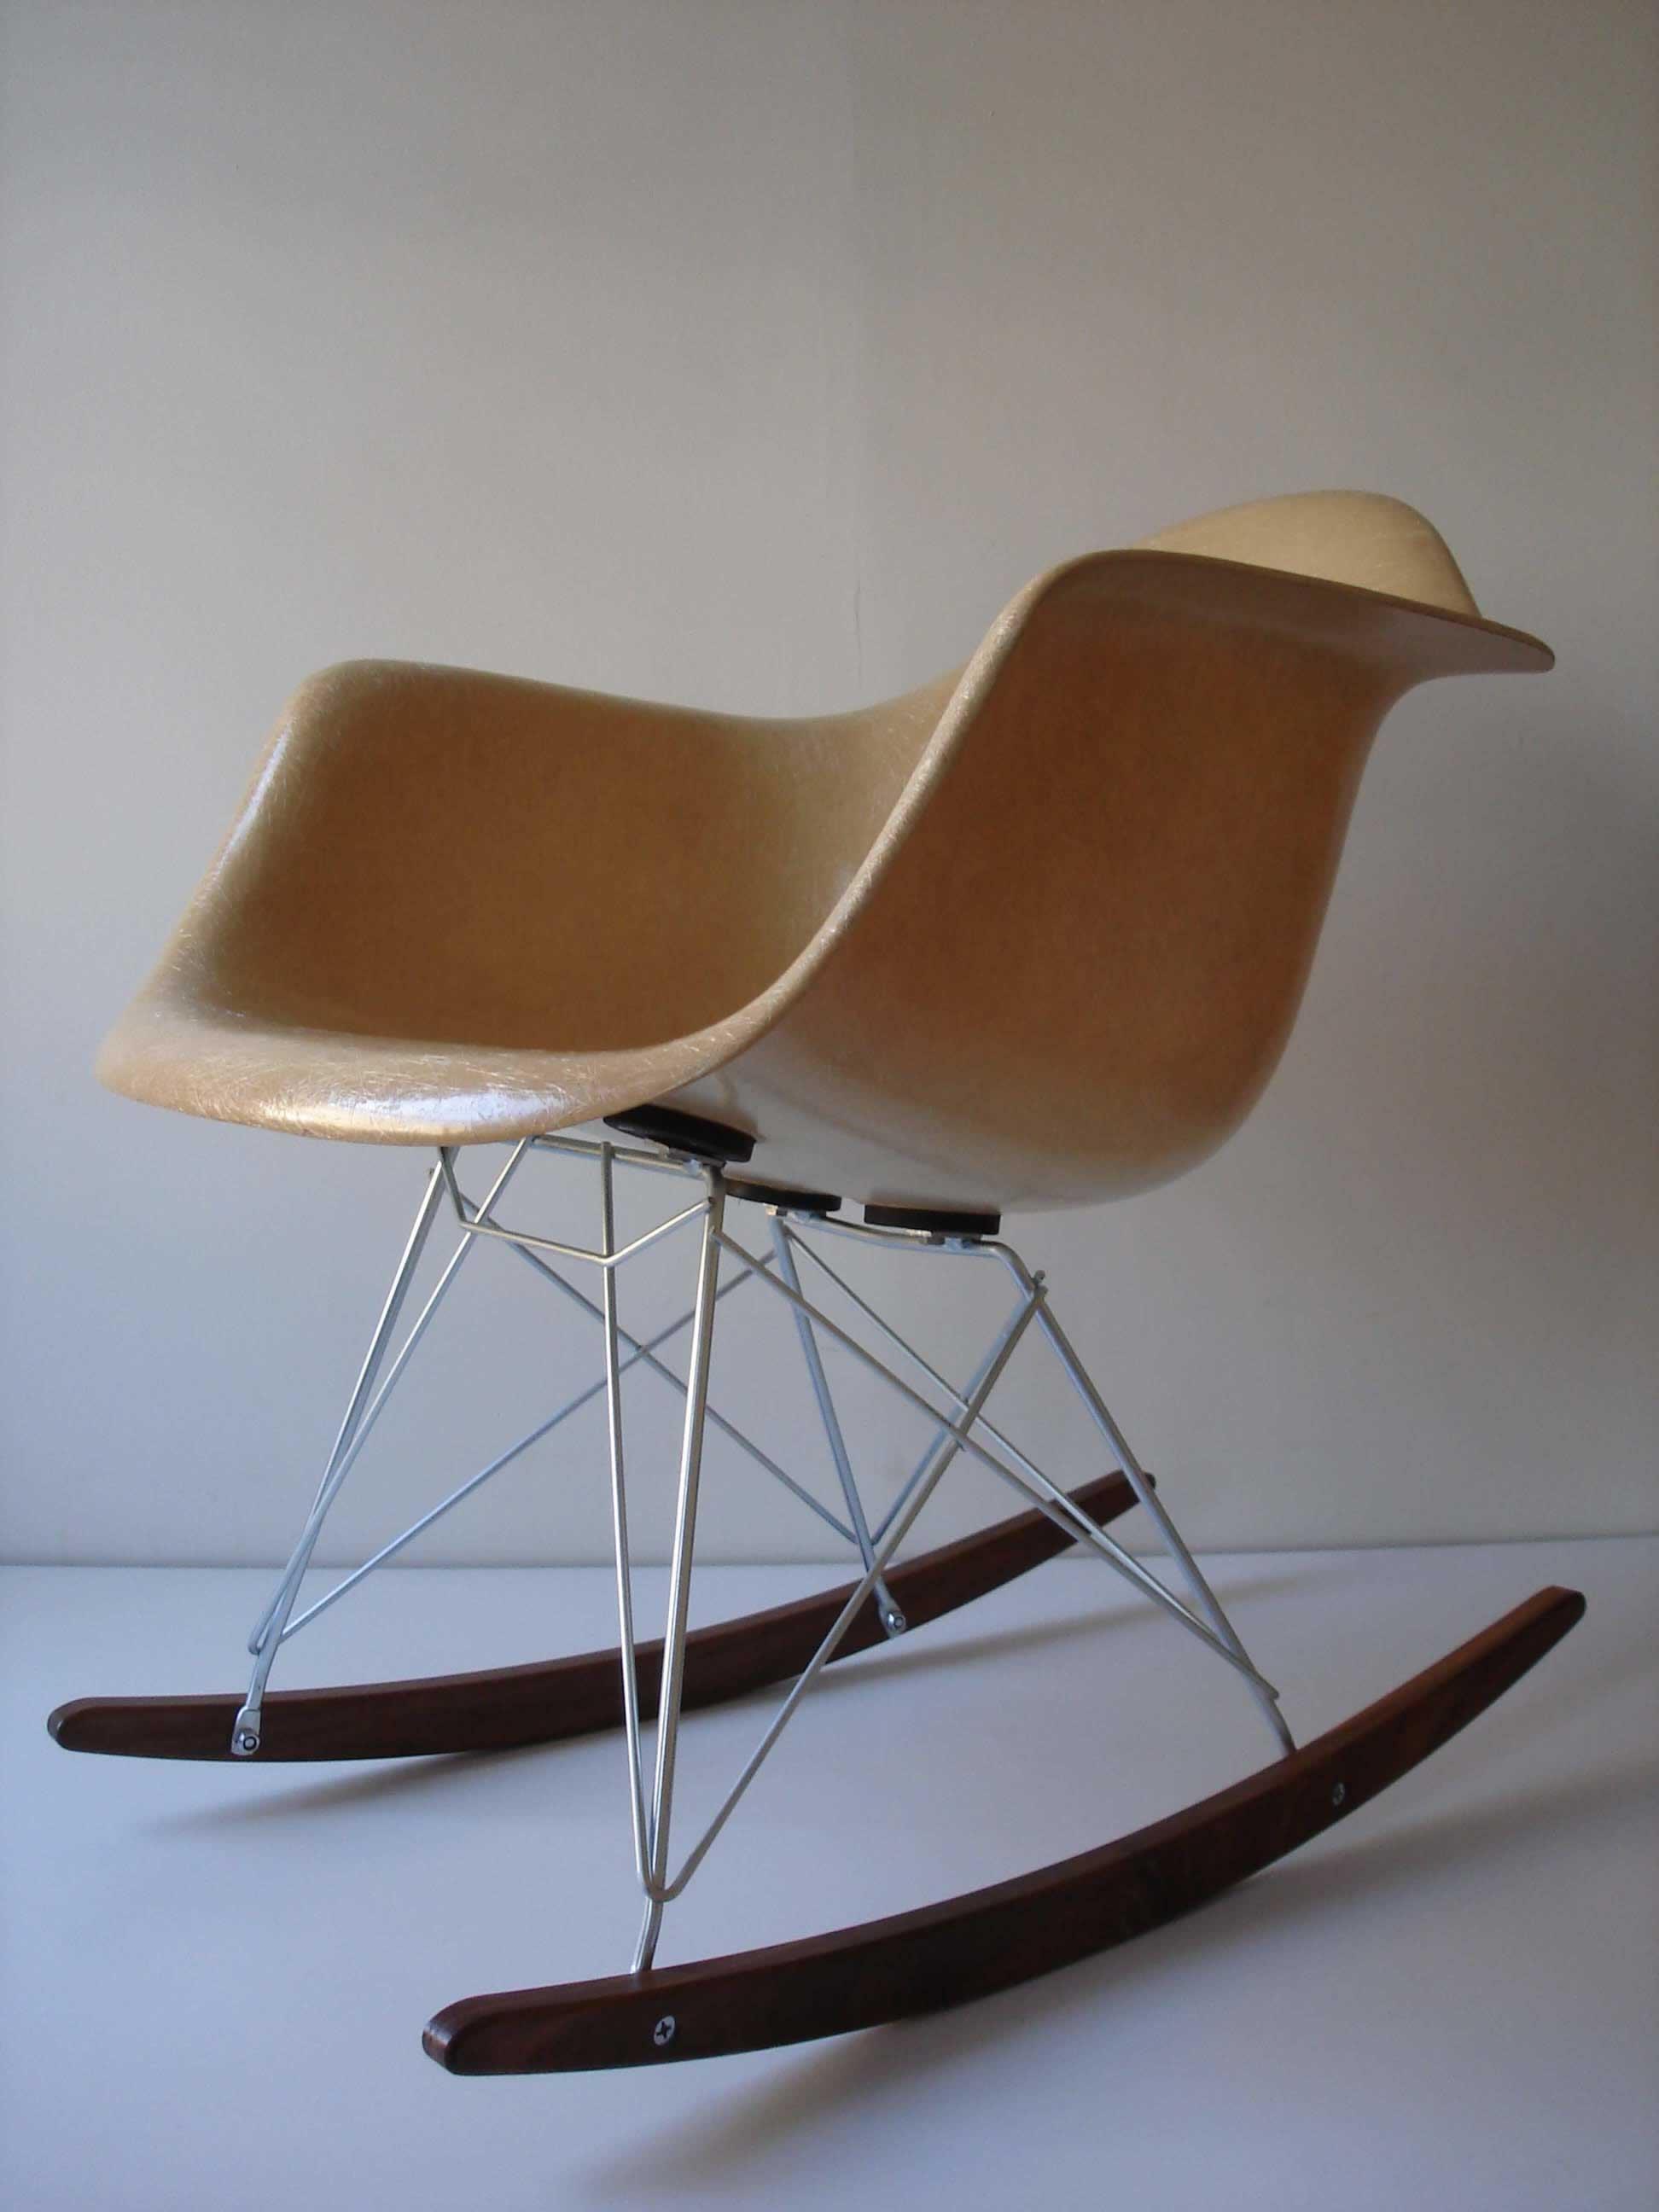 eames rocking chair fold out chairs walmart rar 1948 retro obsessions